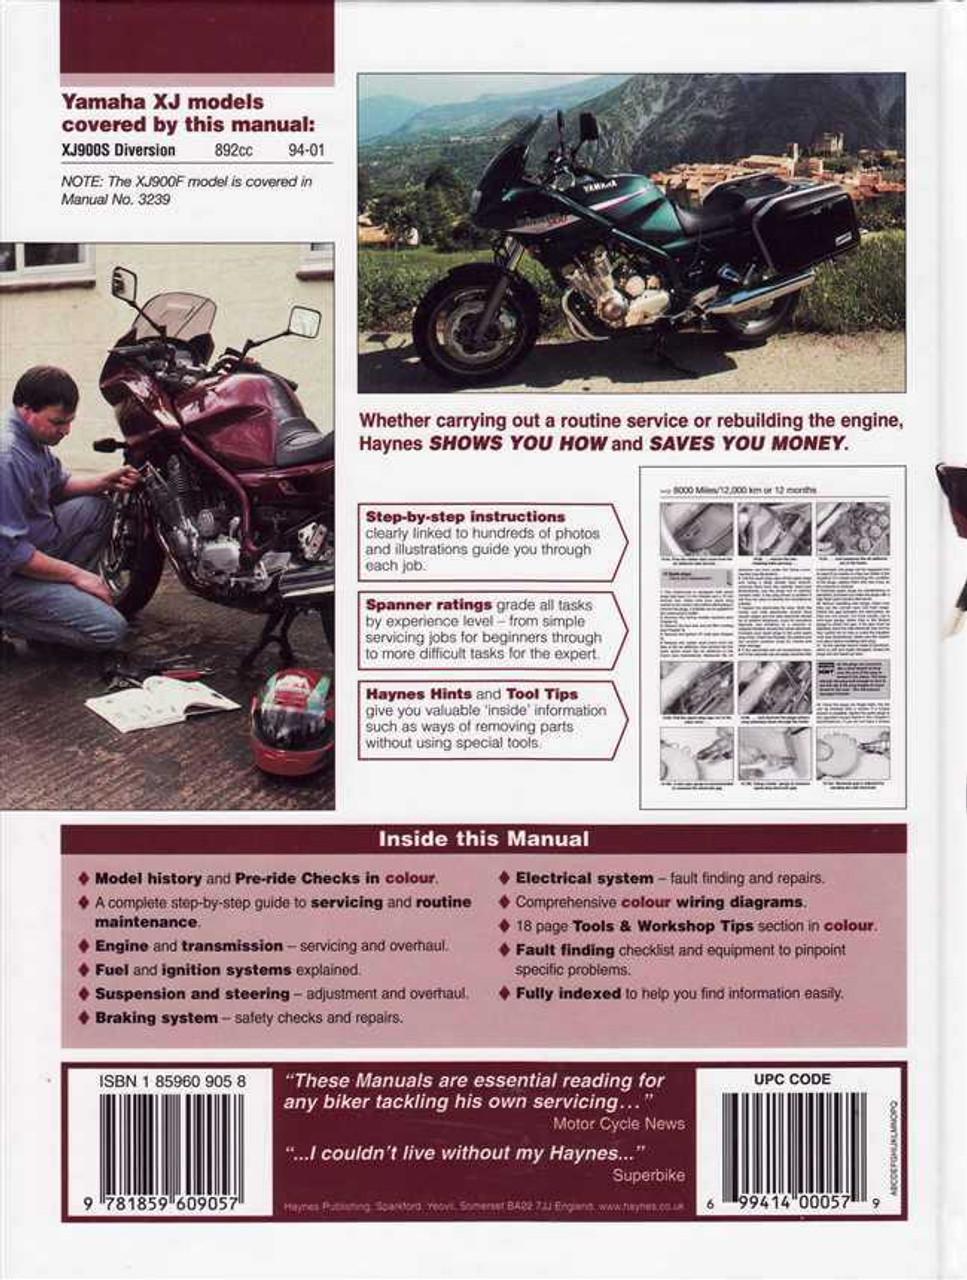 Yamaha Xj900s Diversion 1994 2001 Workshop Manual